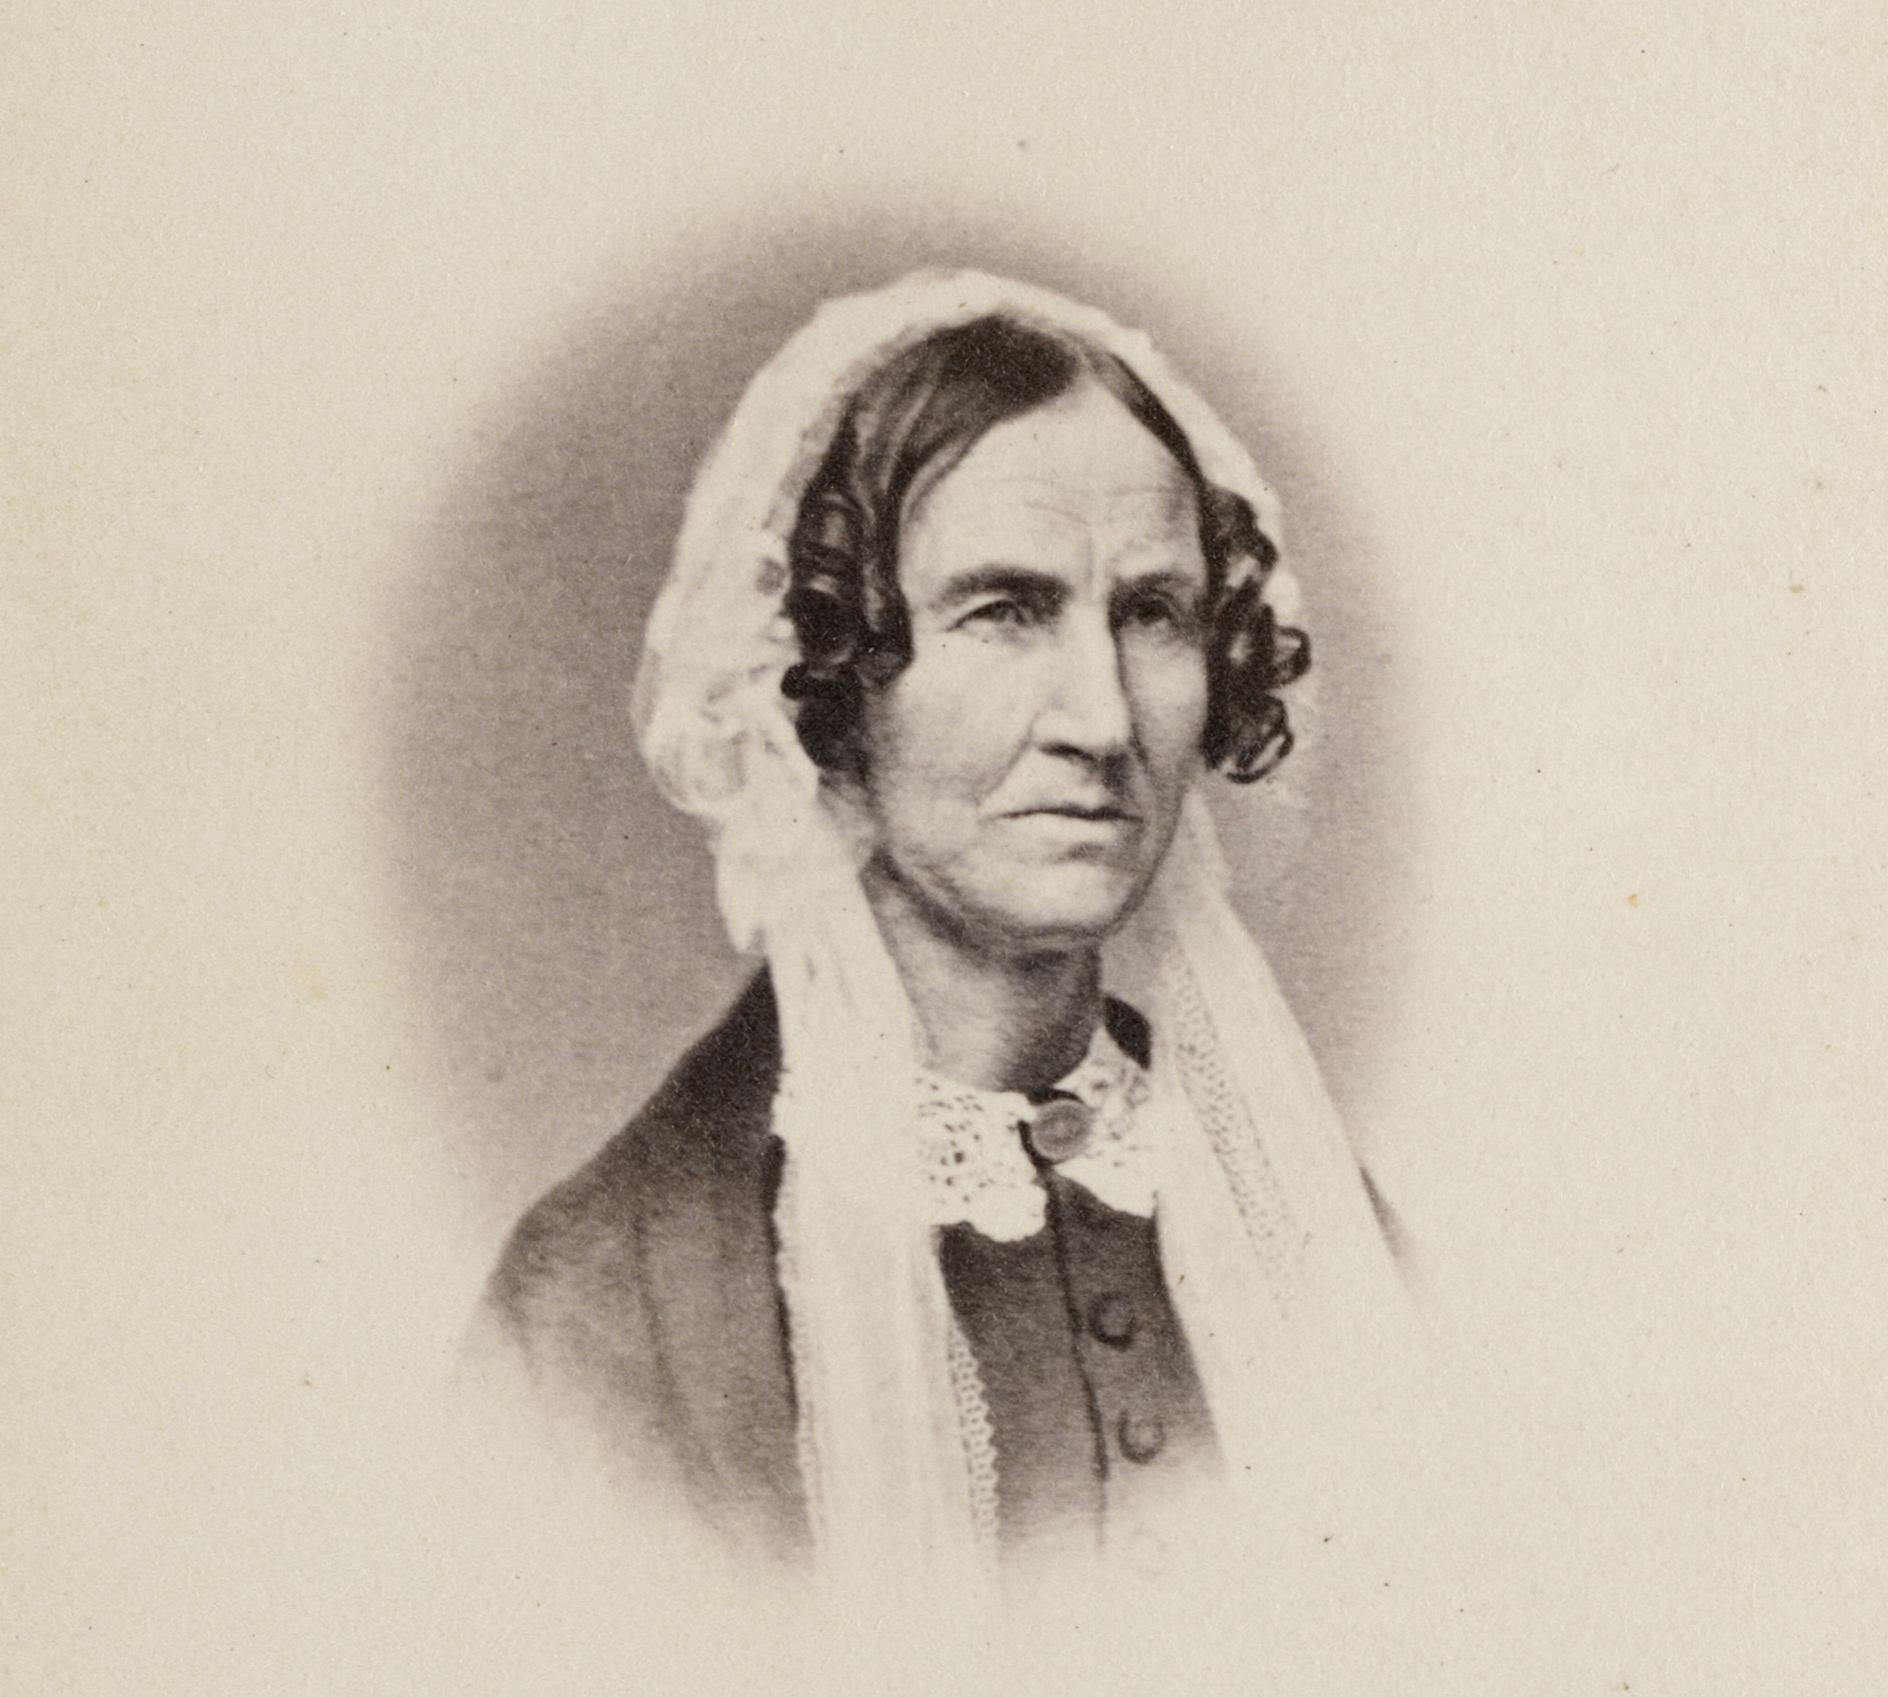 Orra White Hitchcock, scientific illustrator Courtesy of Smith College Archives